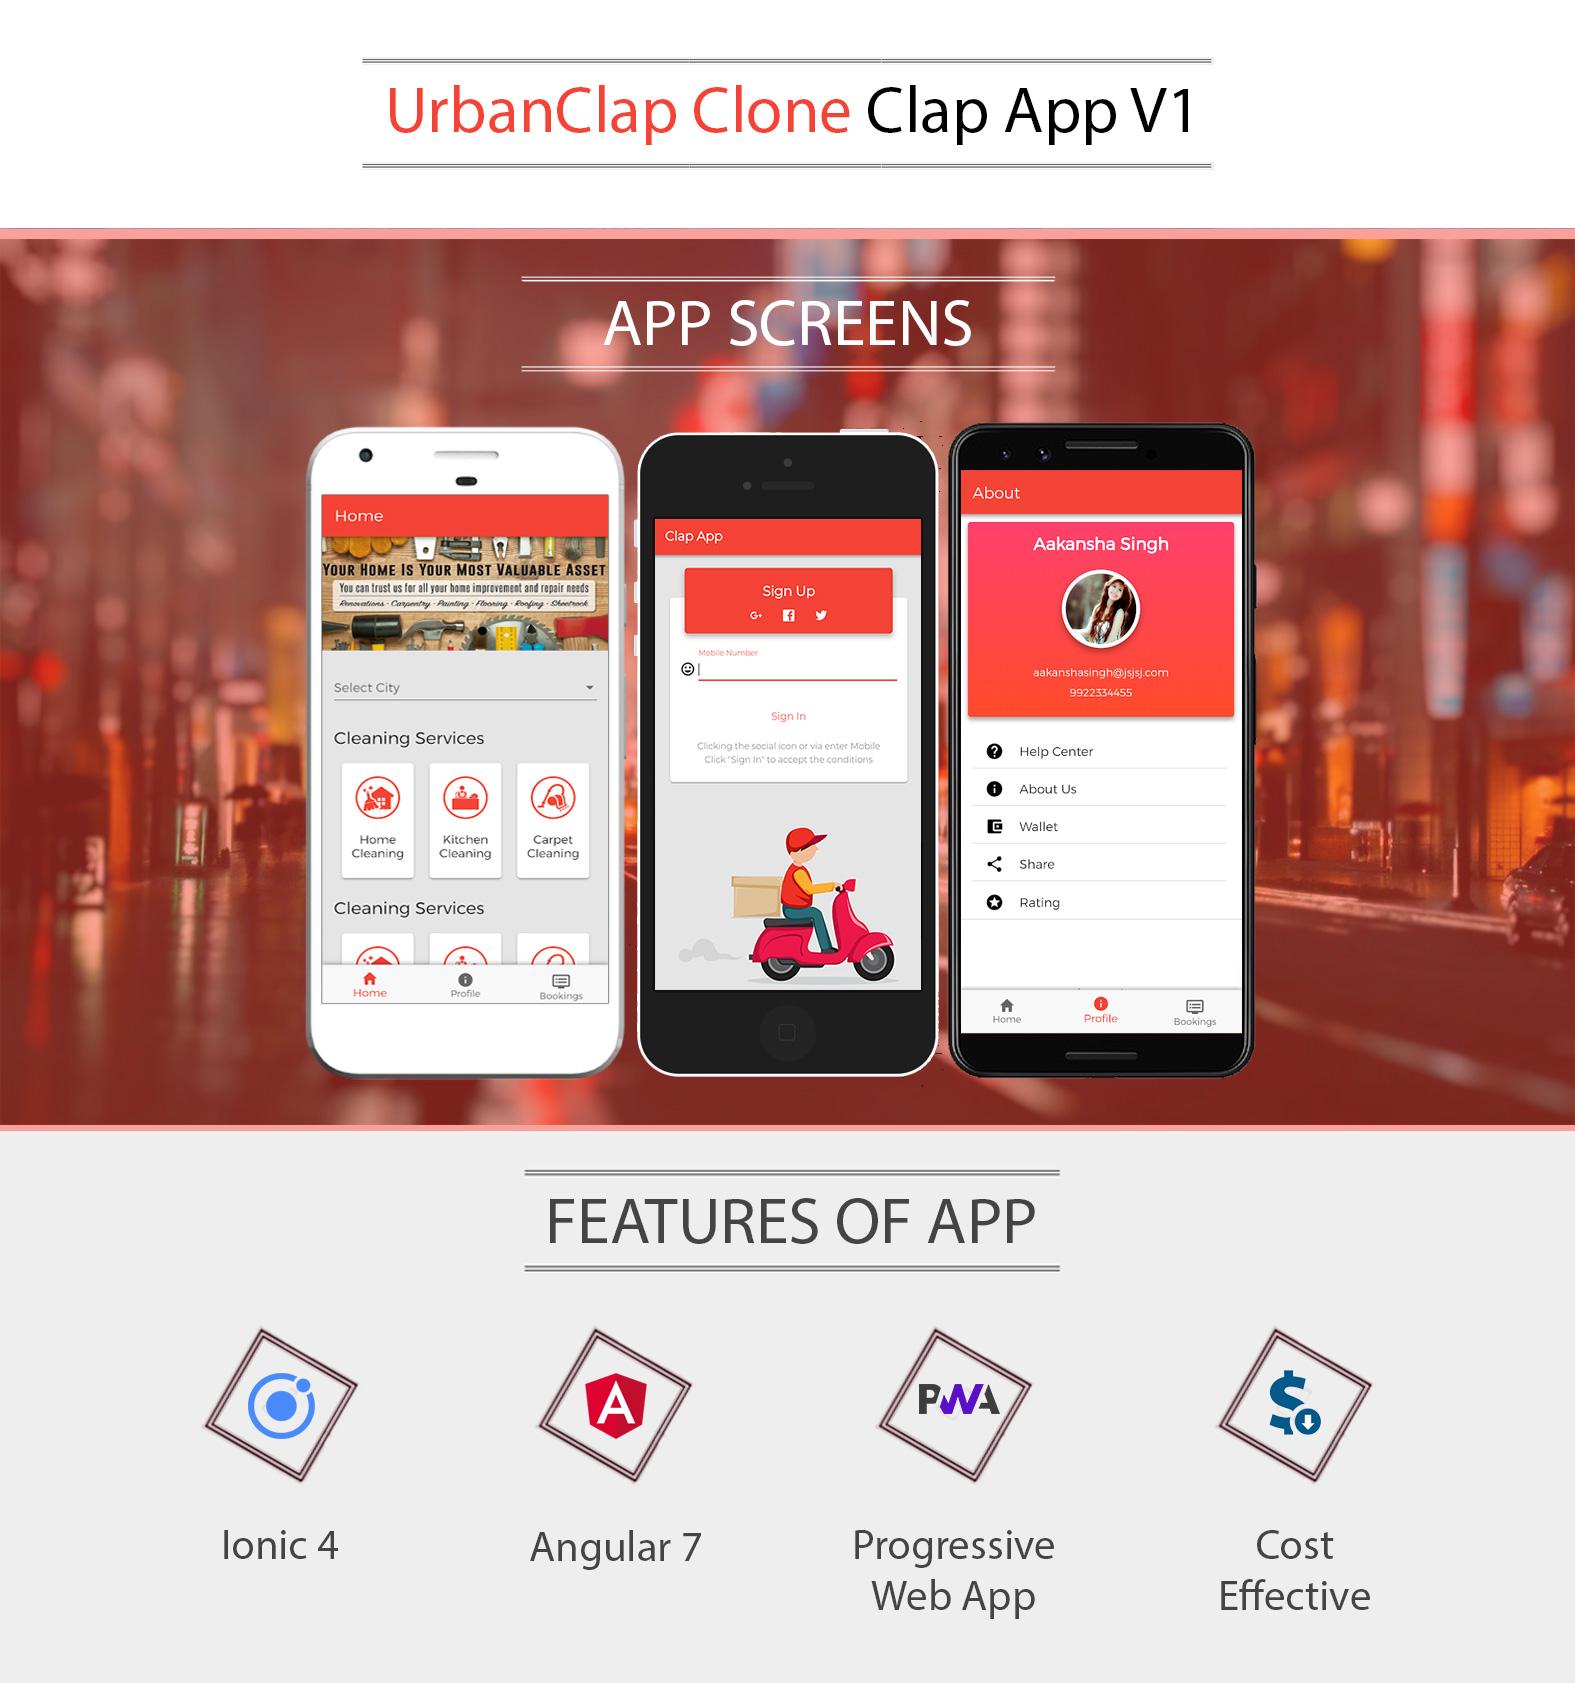 iThemes Vidhema | Ionic 4 & Angular 7 Urbanclap V1 App